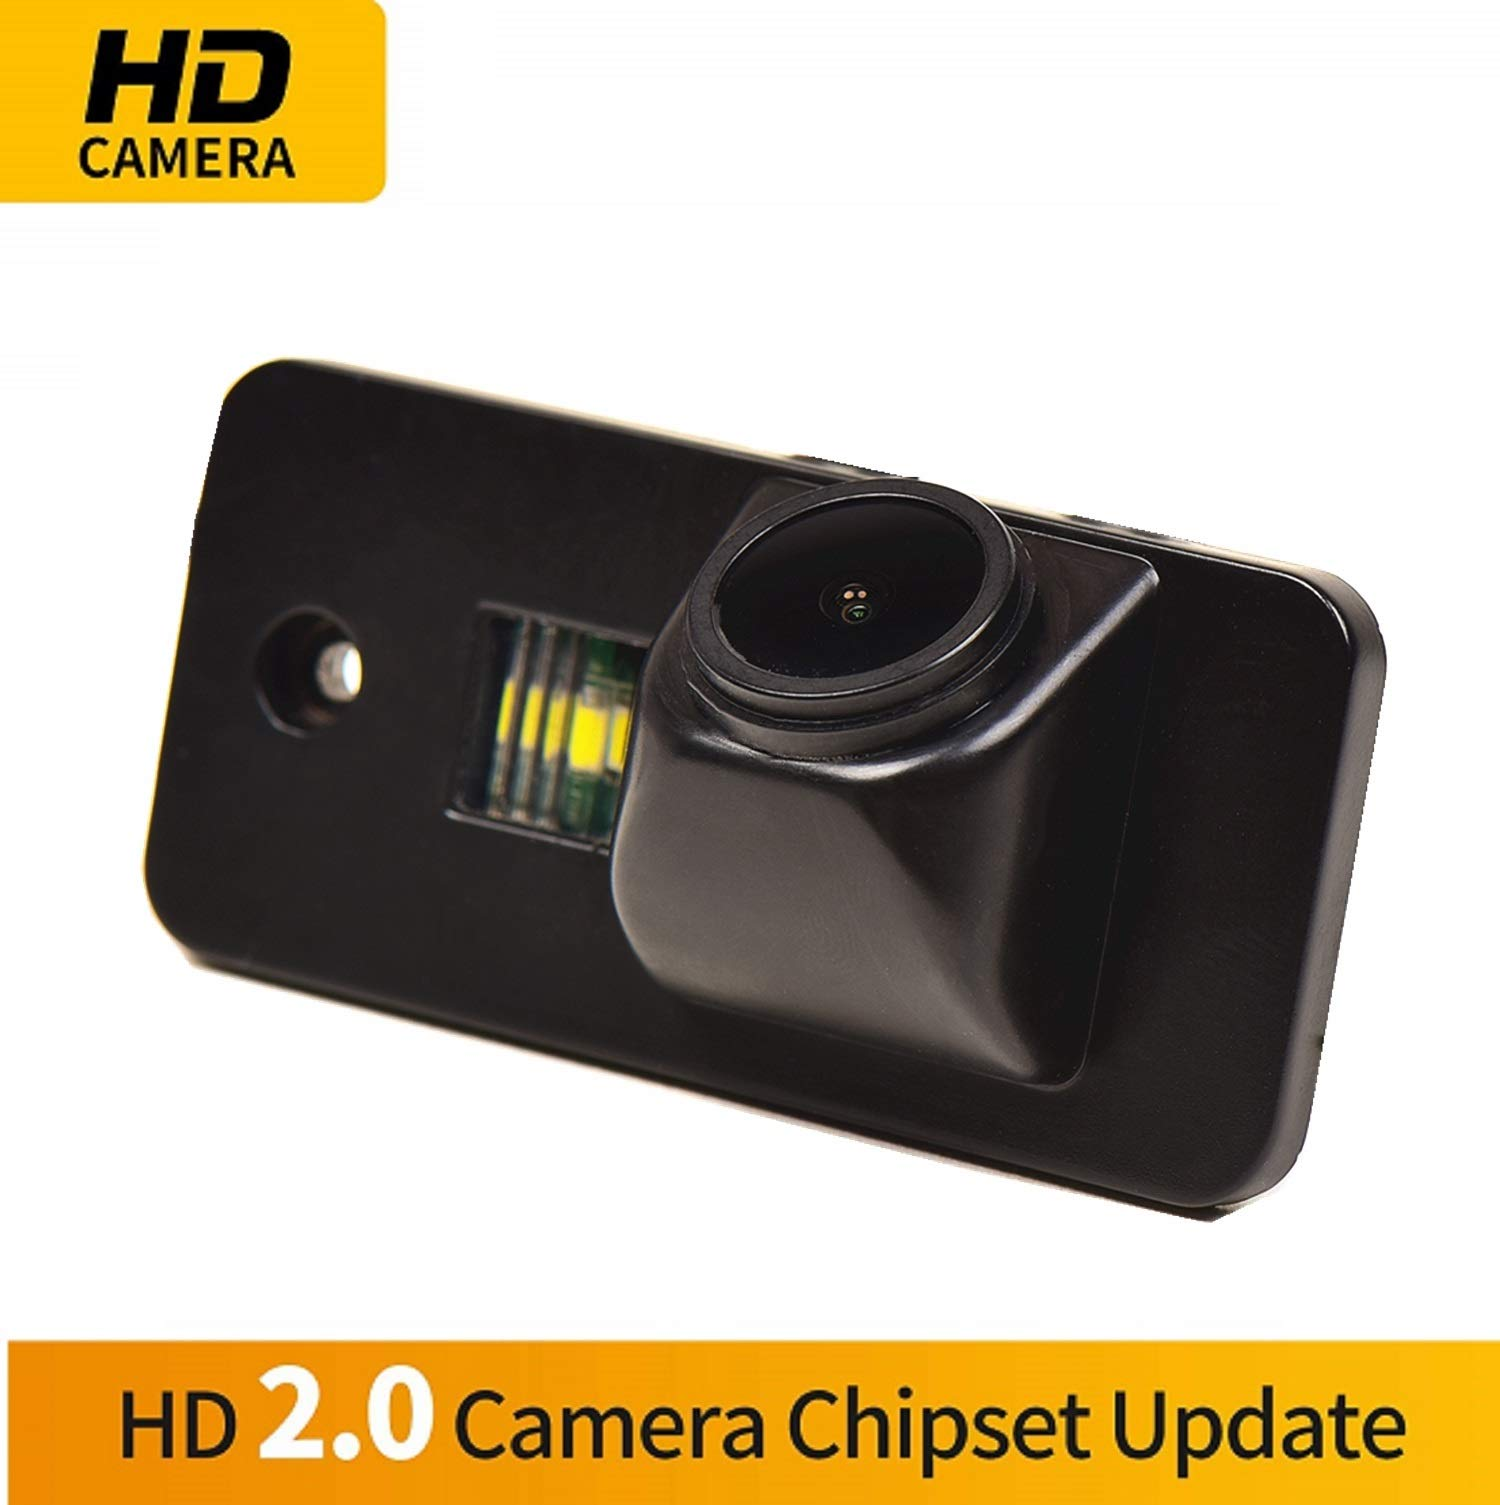 Rckfahrkamera-integriert-in-Nummernschildbeleuchtung-Nummernschildbeleuchtung-Rckfahrkamera-fr-Audi-A1-A3-A4-A5-A6-RS4-TT-Q5-Q7-VW-Passat-R36